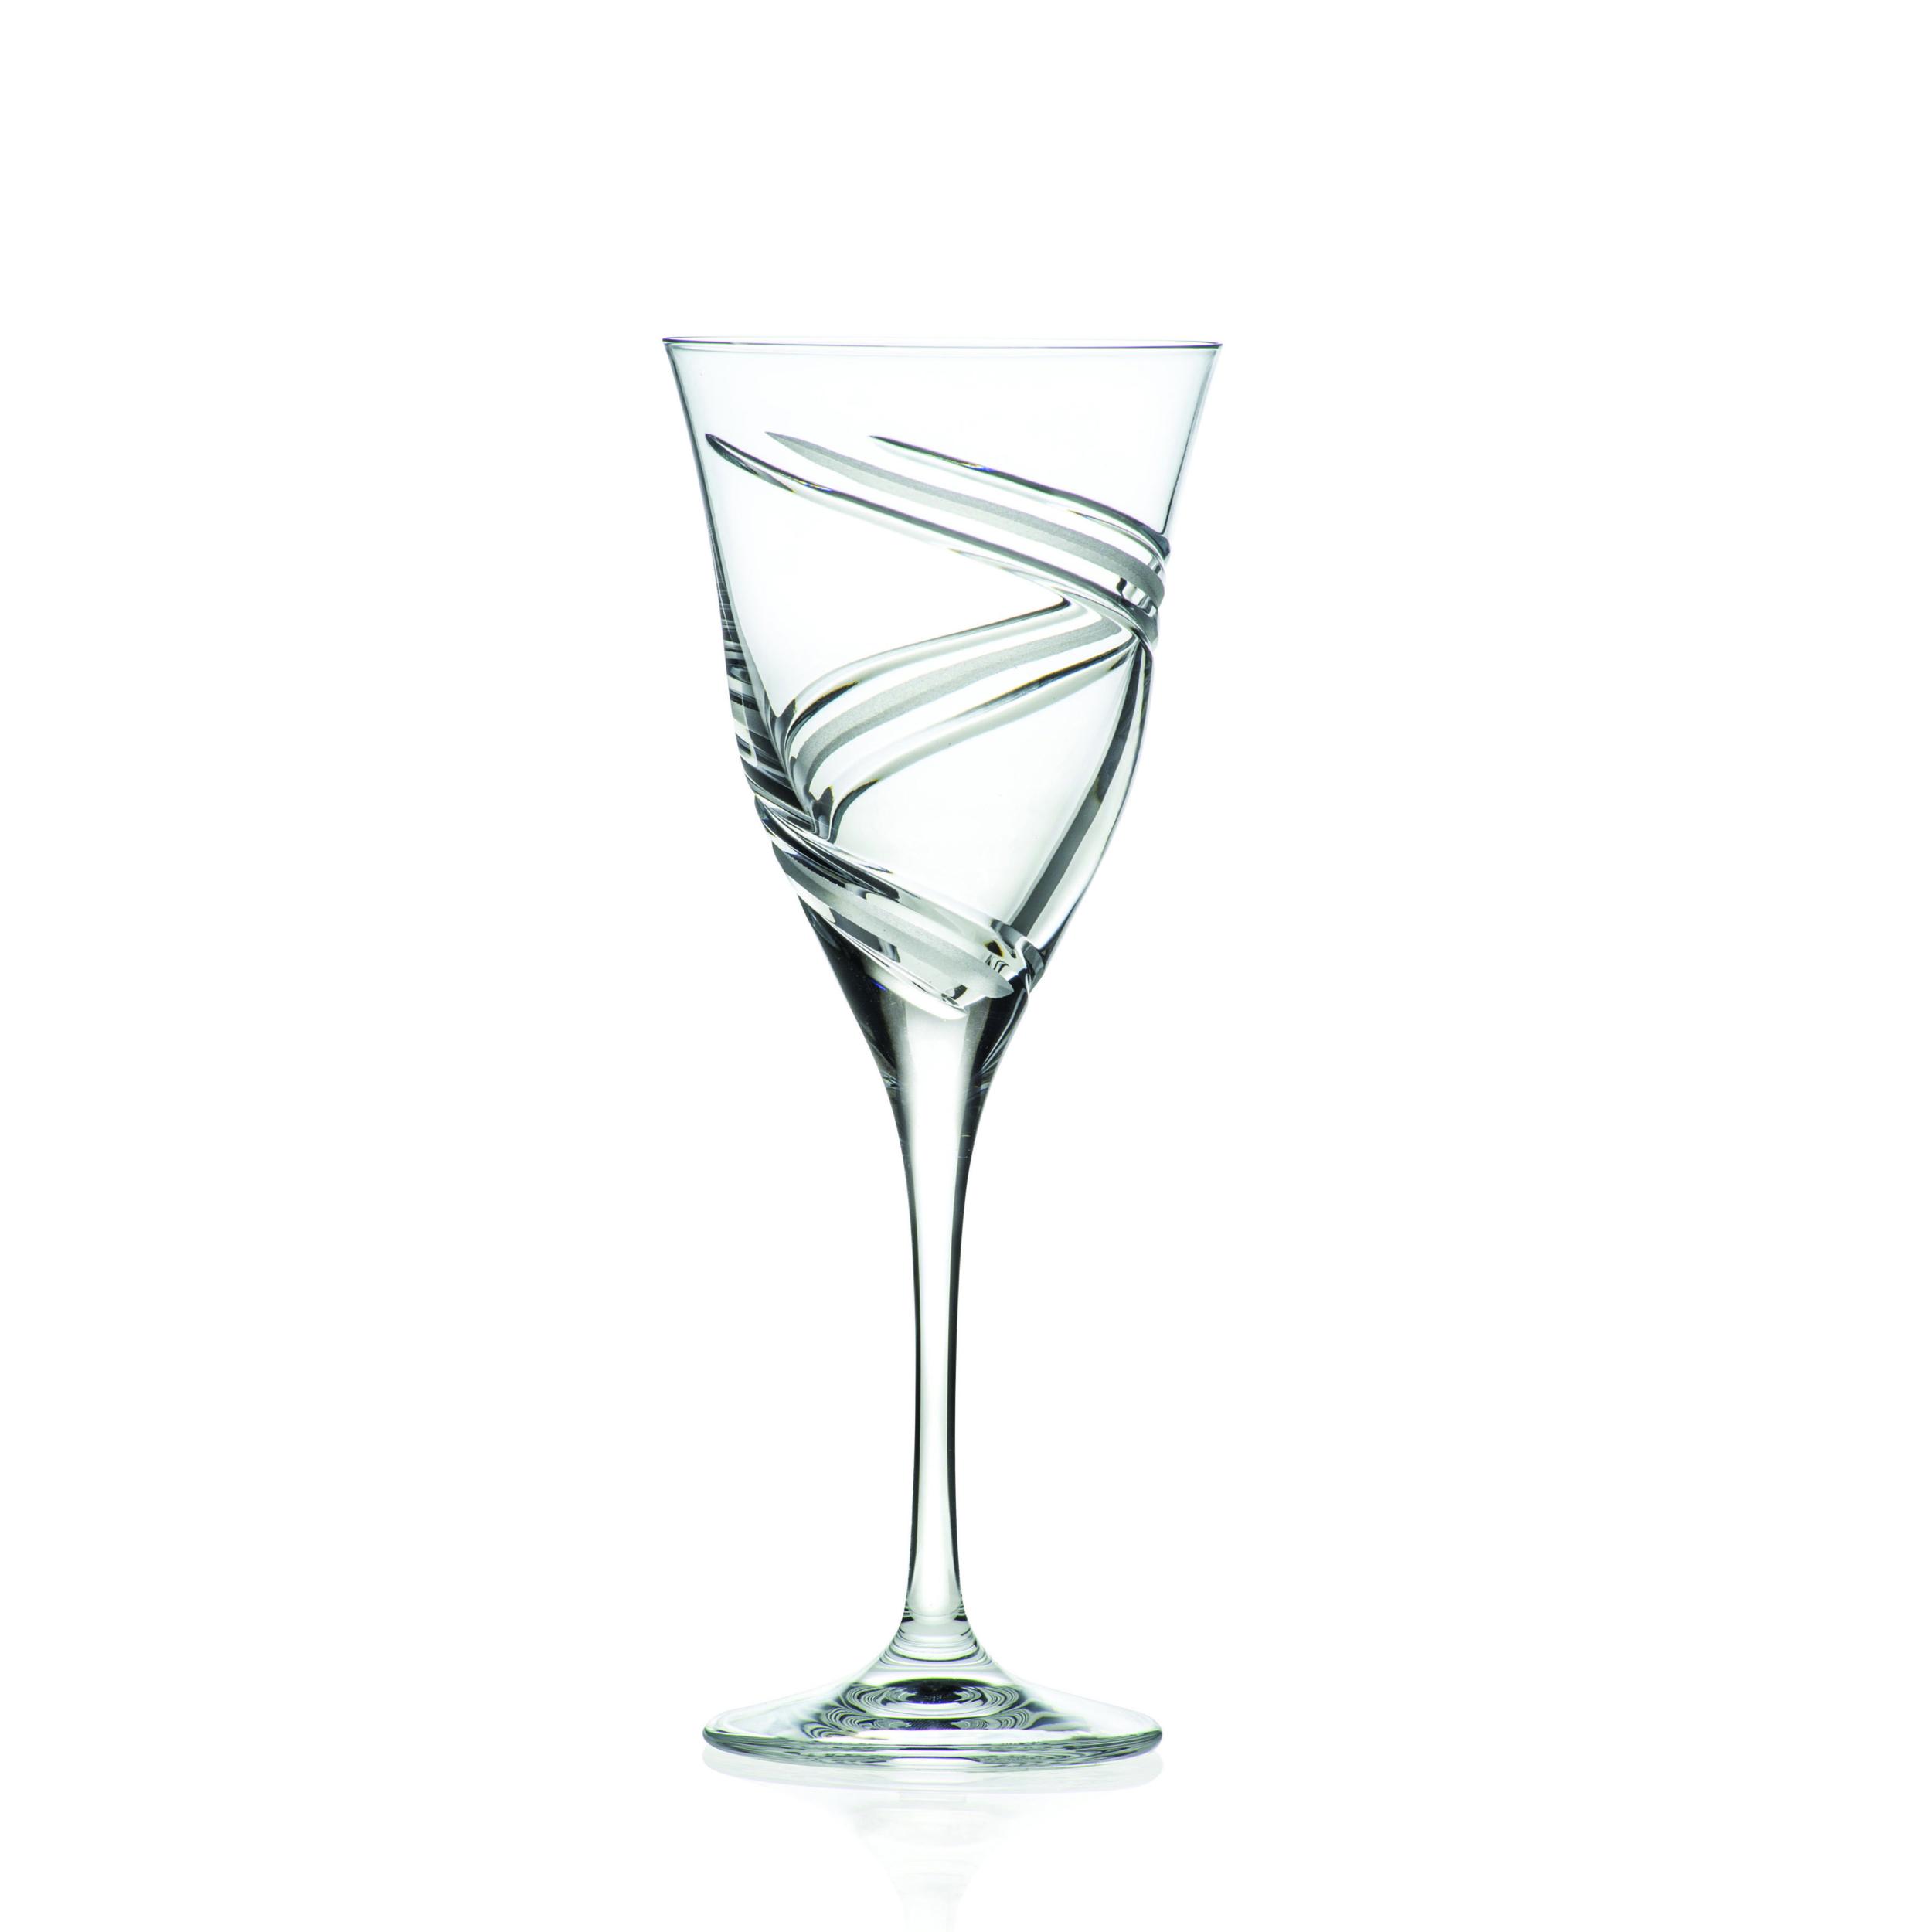 2 Verres à Vin en cristal Vertige